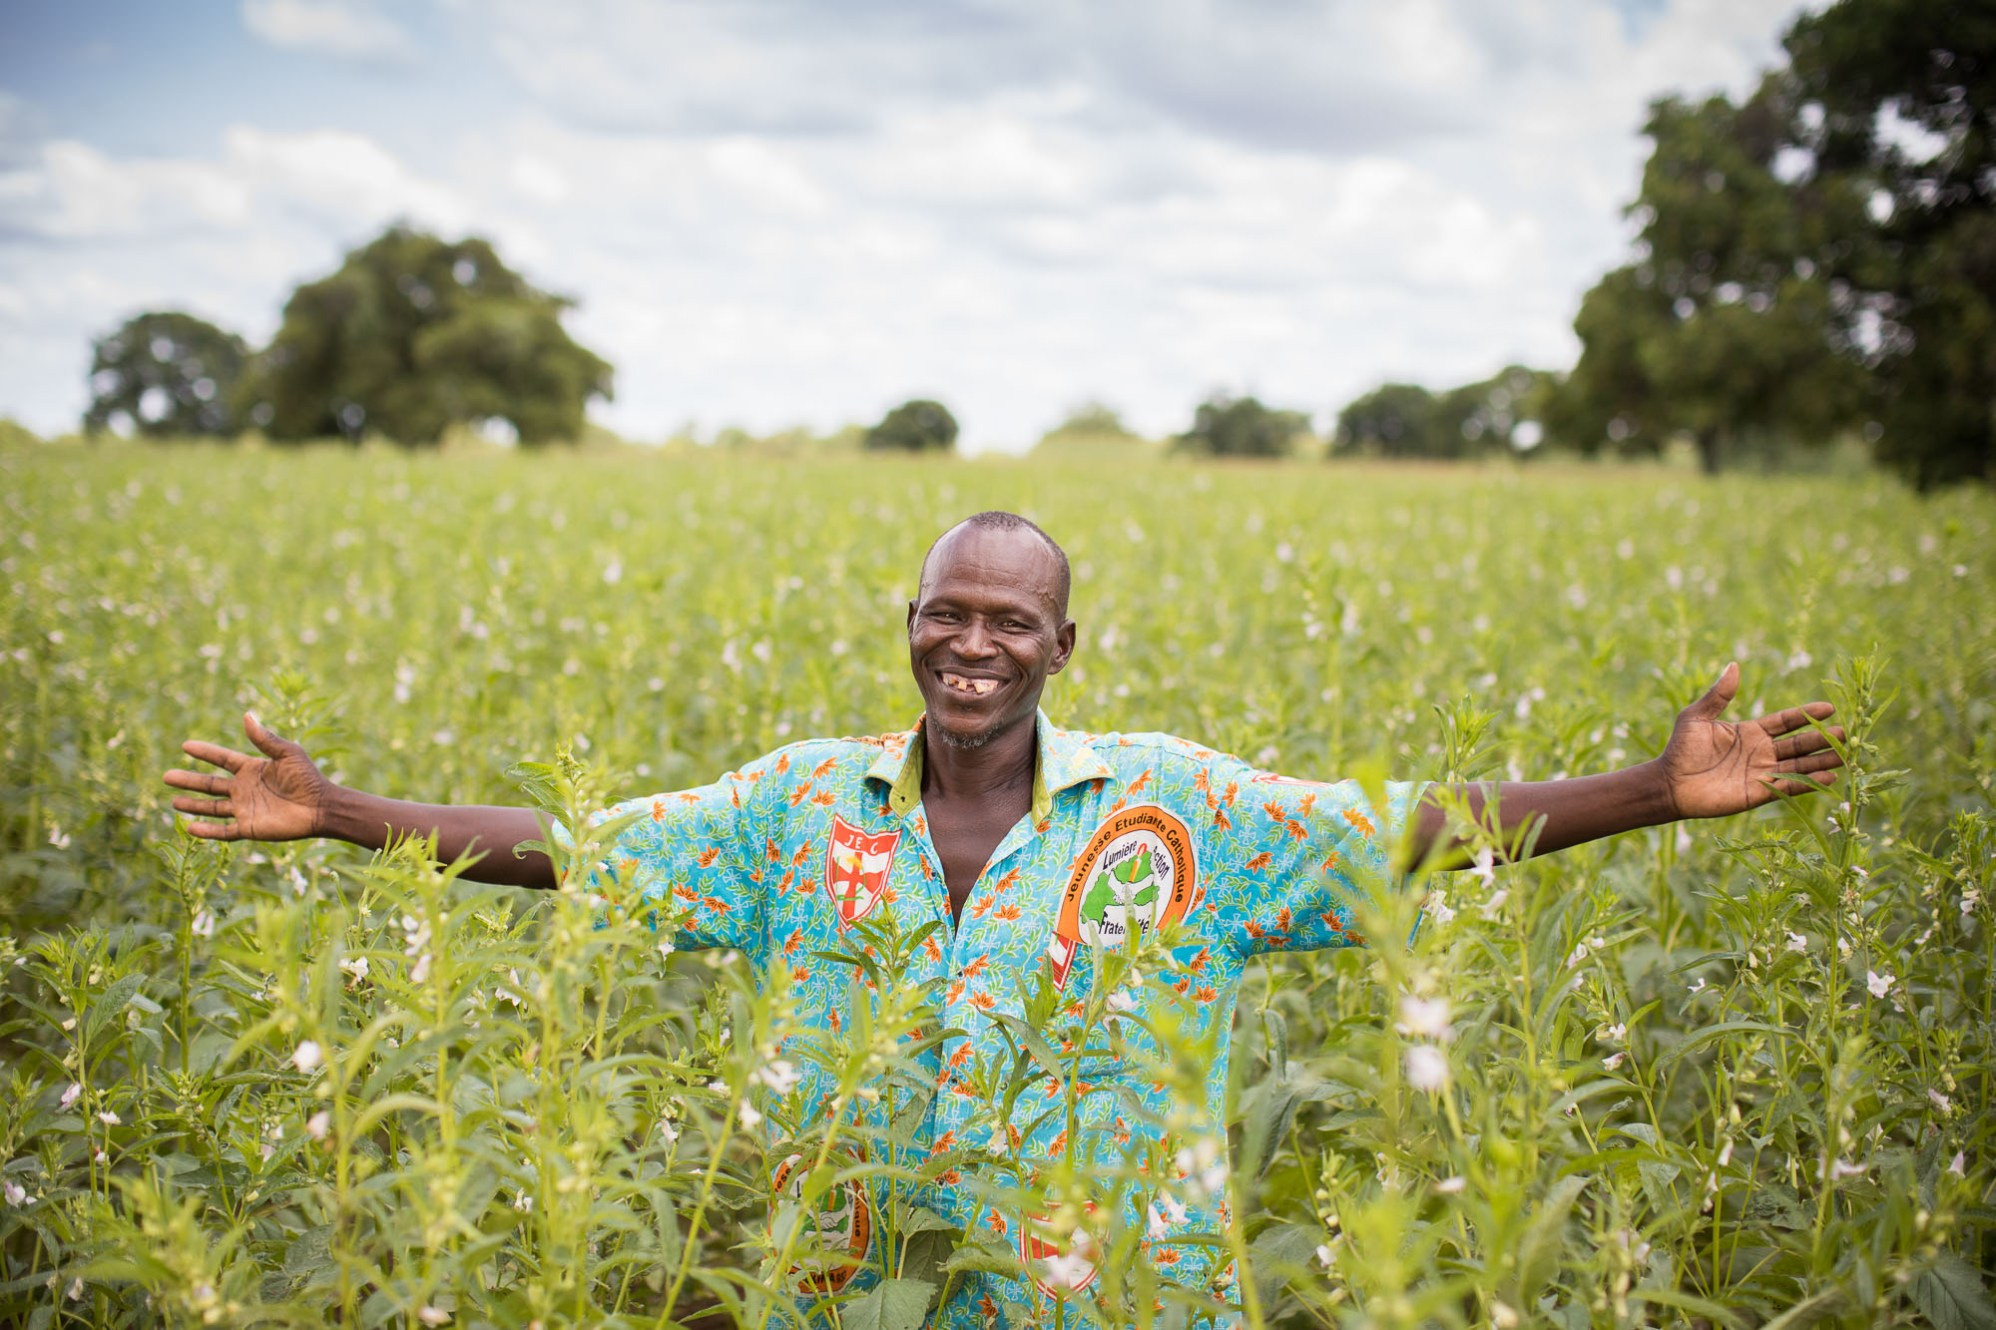 A farmer basks in his sesame fields in Boucle de Mouhoun Province, Burkina Faso.